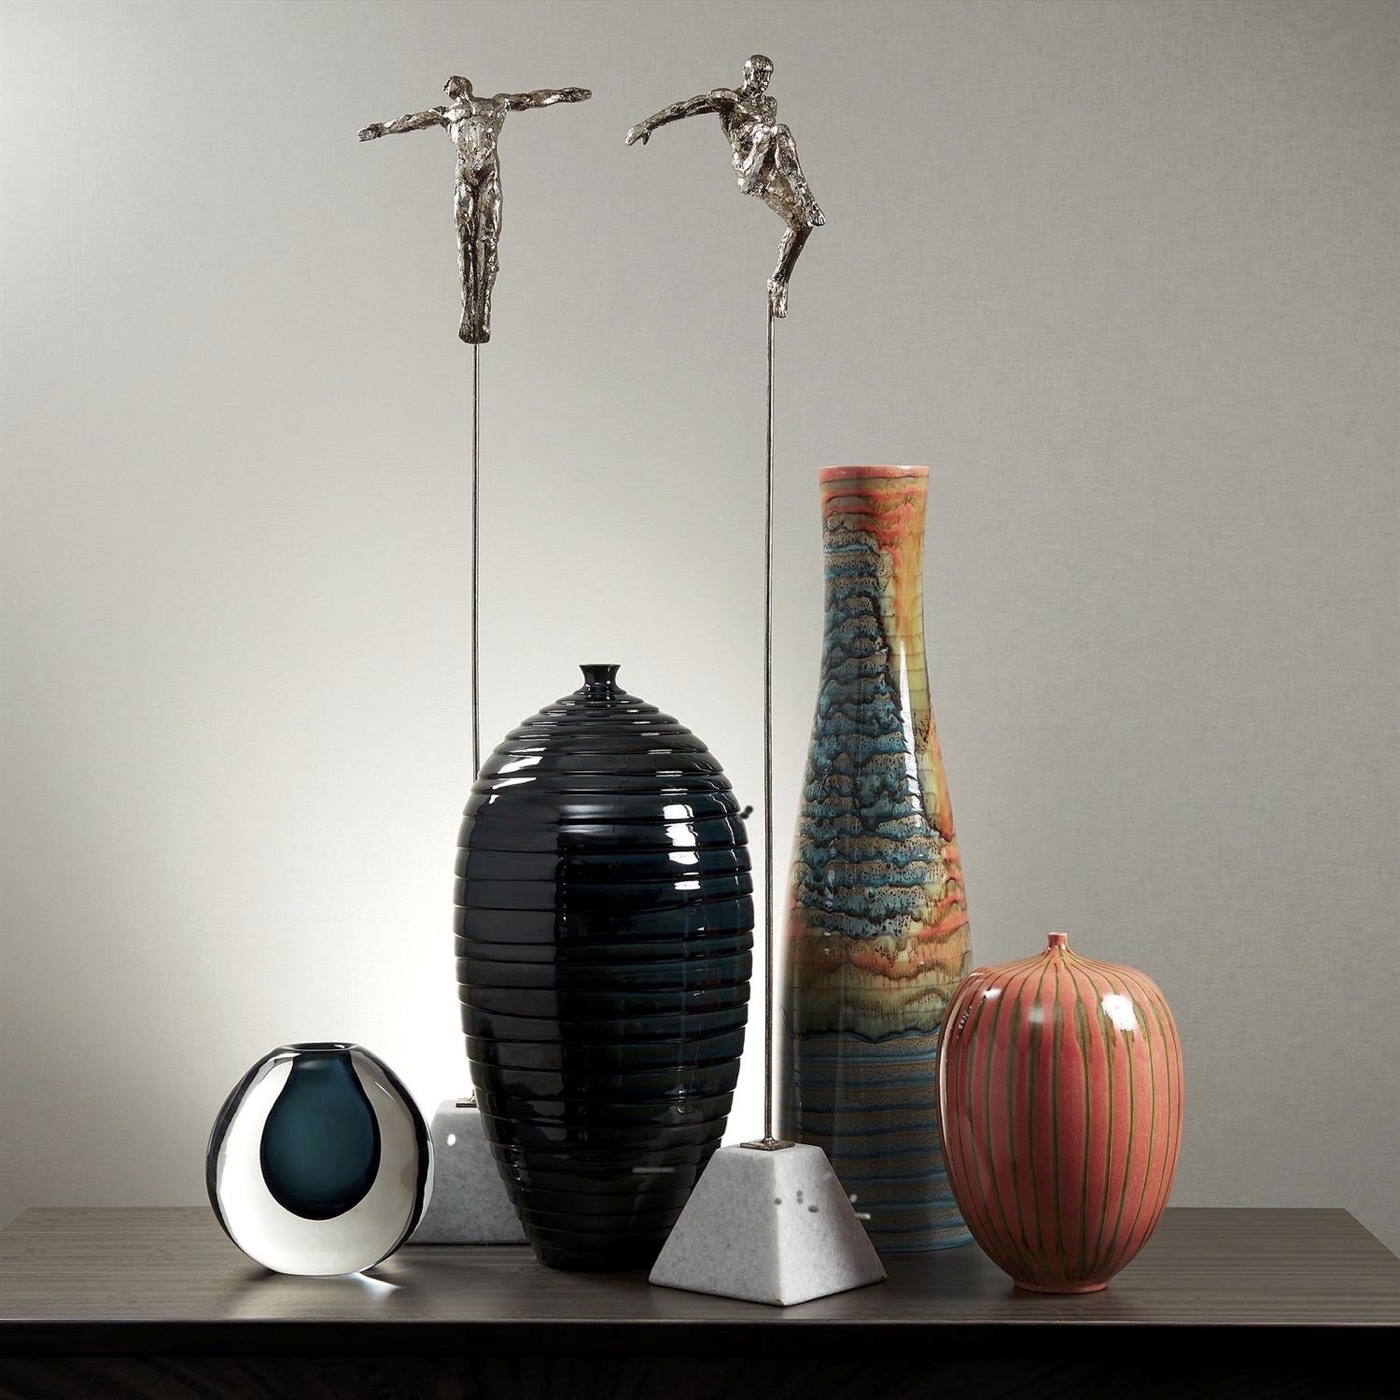 Saul Striated Ceramic Vases